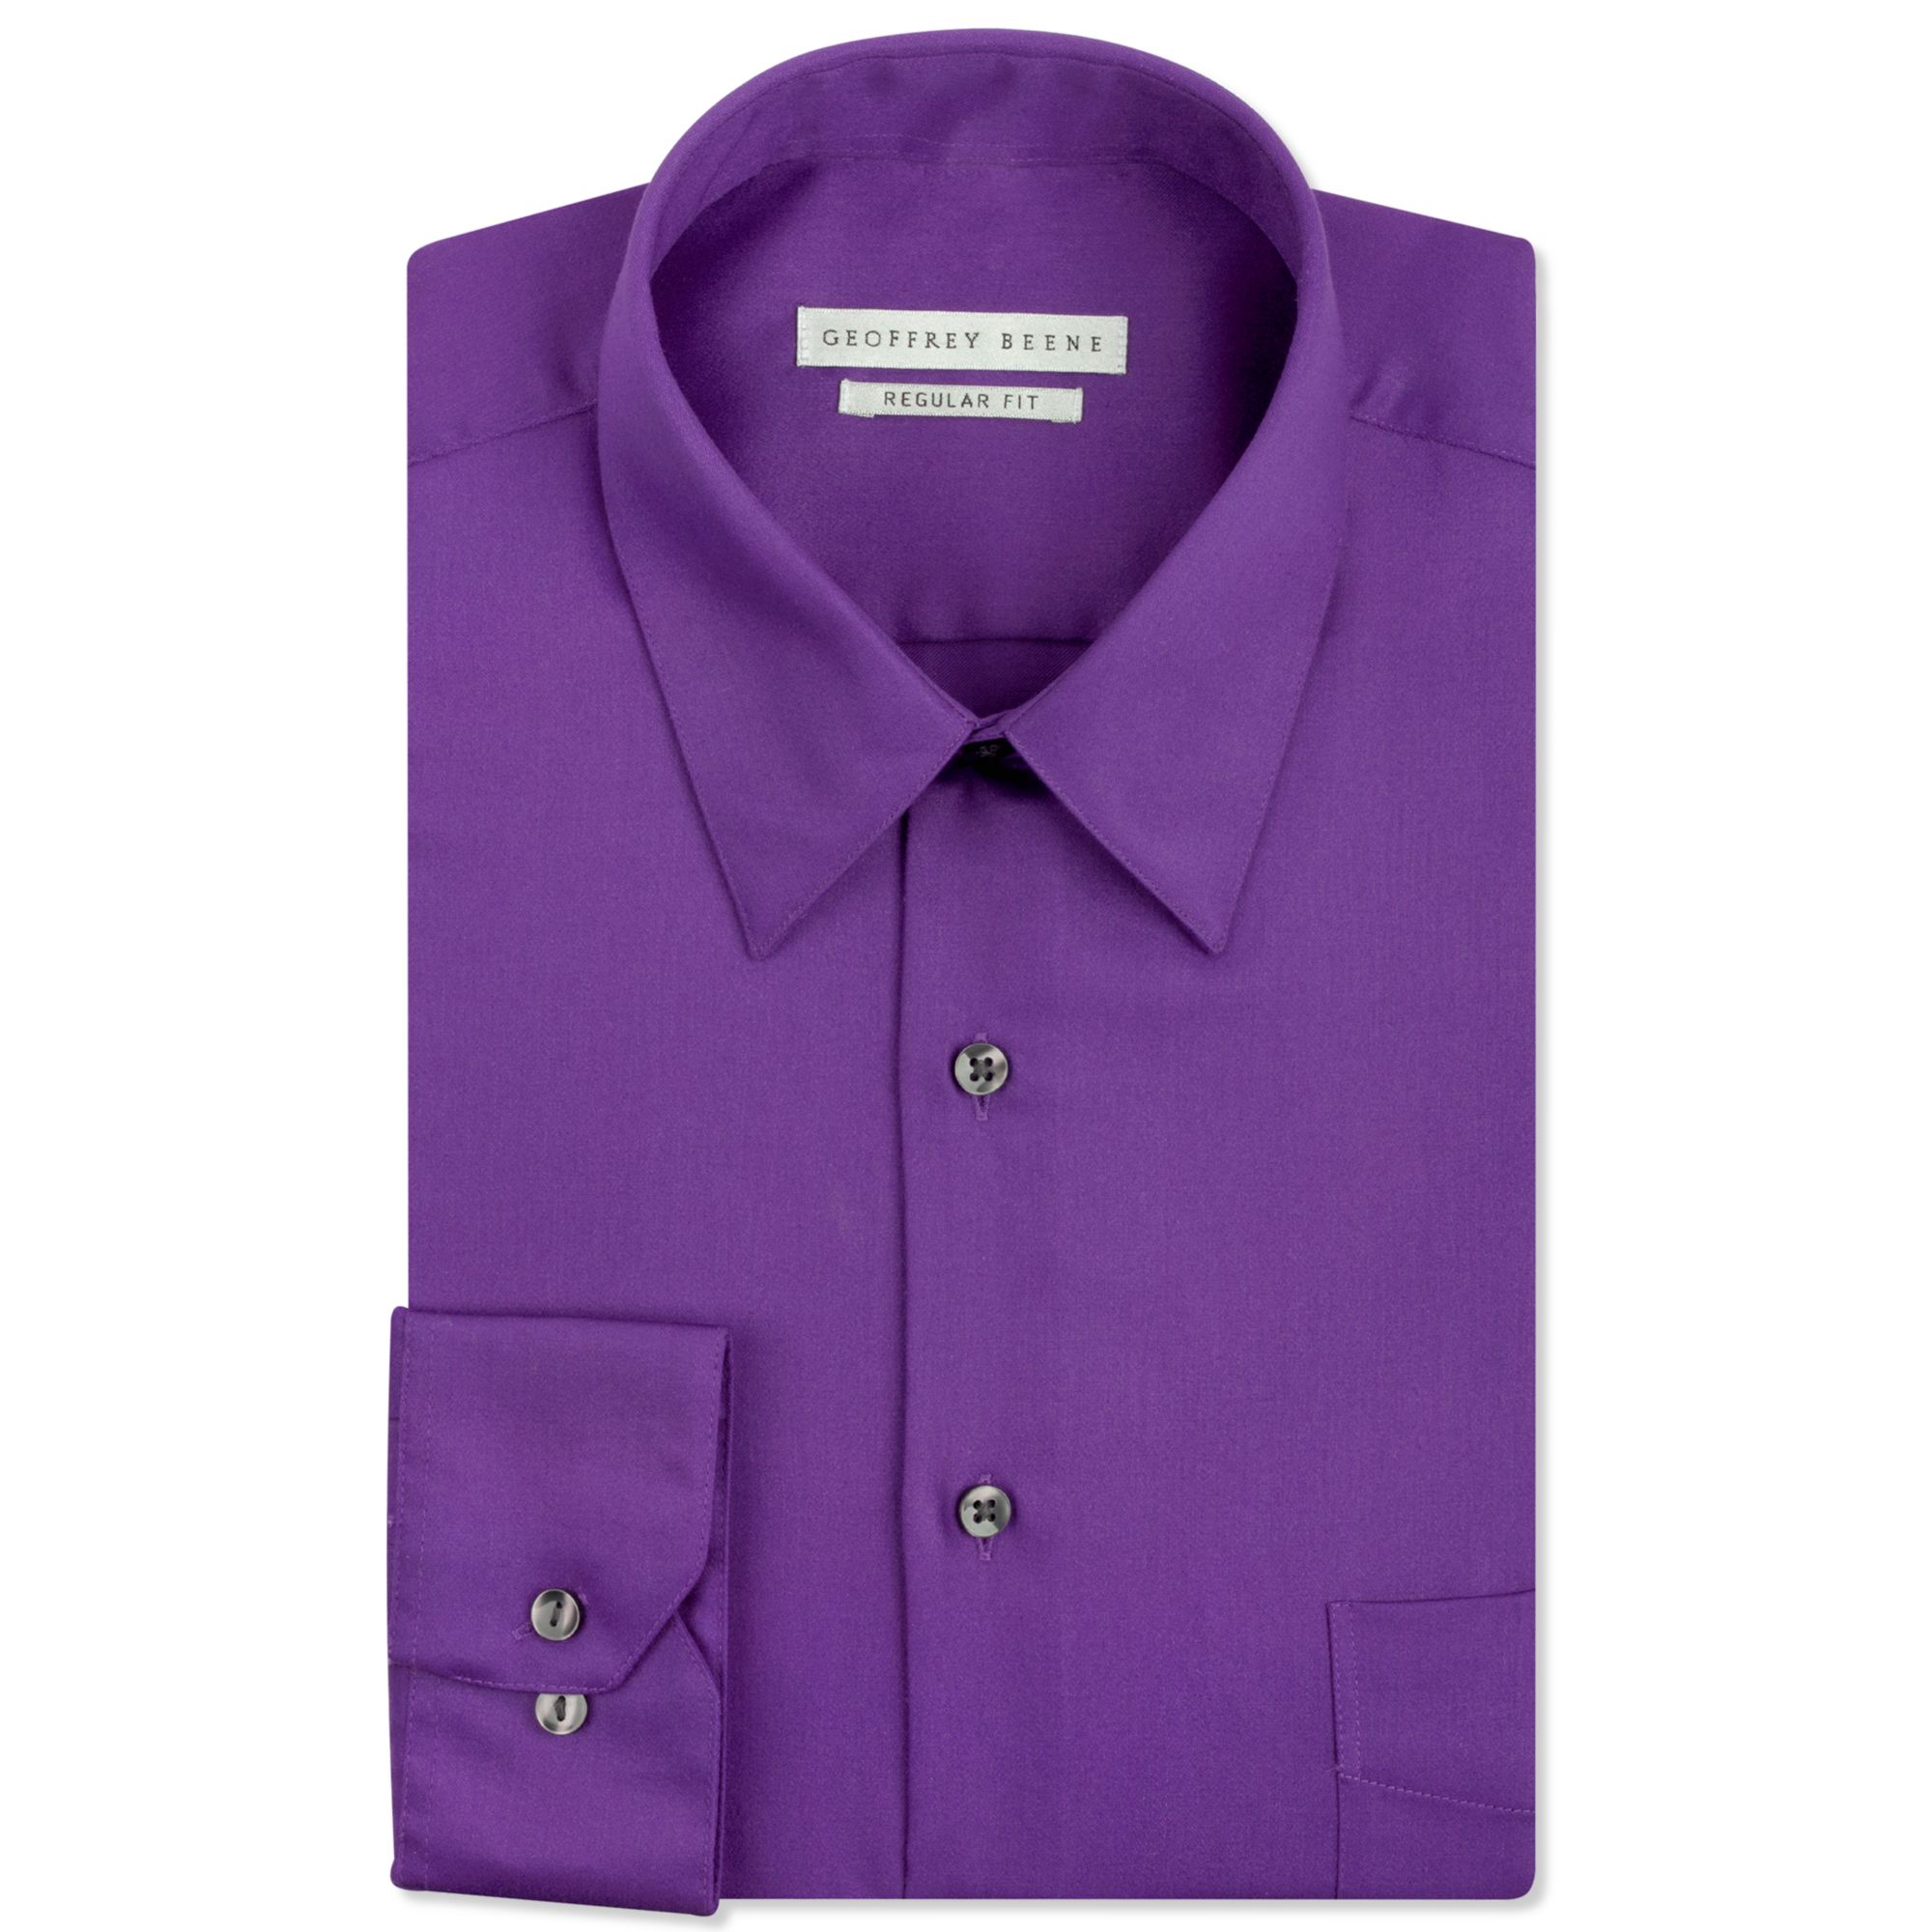 Geoffrey Beene Sateen Solid Dress Shirt In Purple For Men